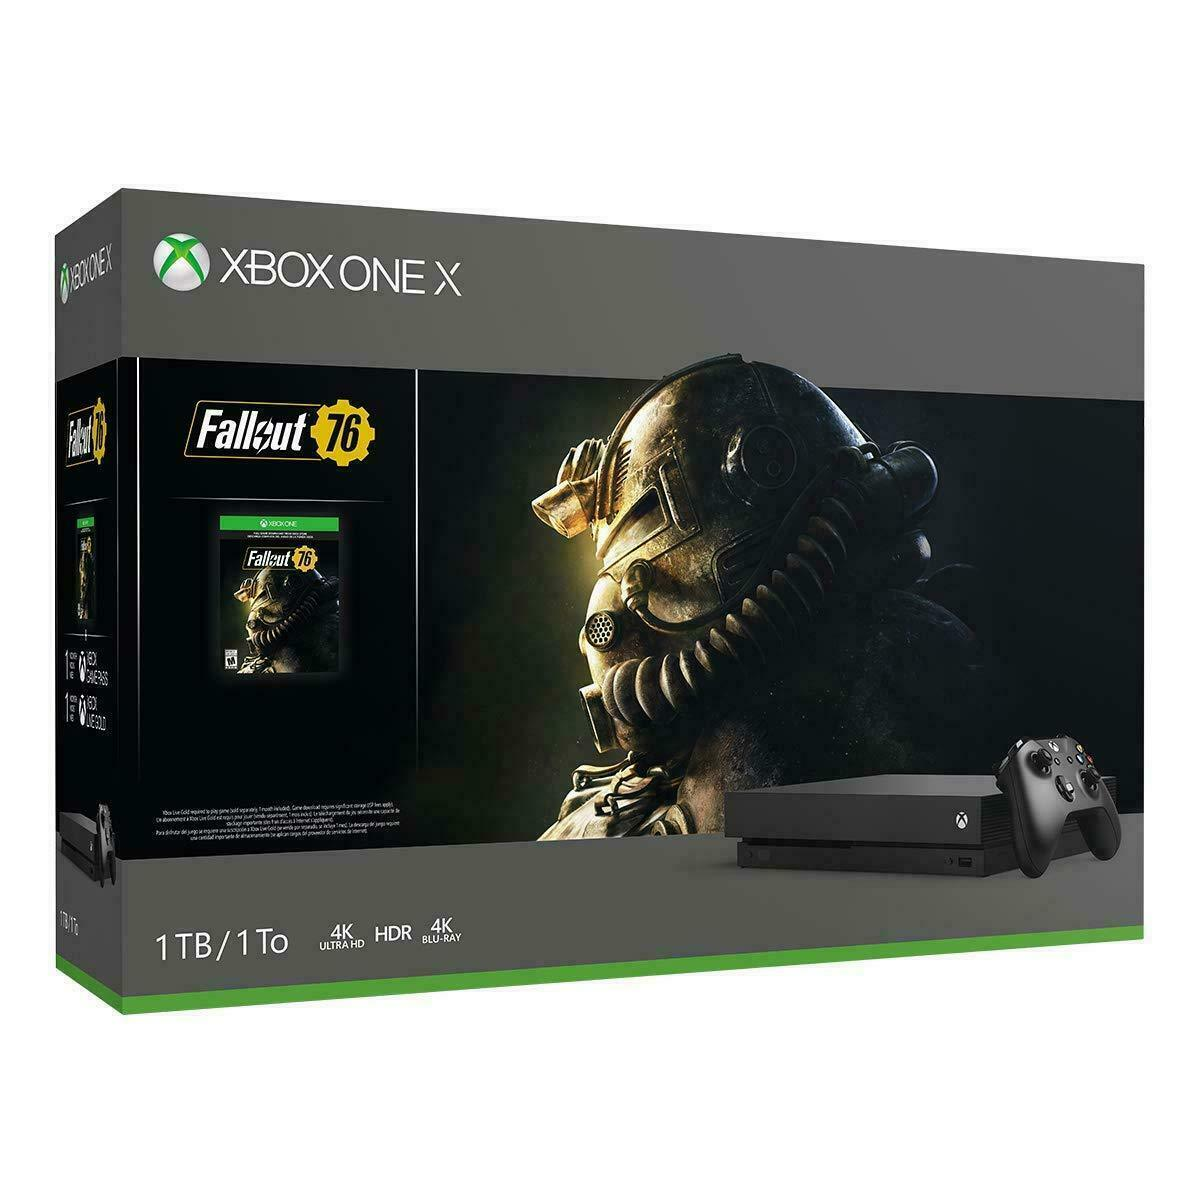 Xbox One X 1TB 4K Ultra HD Blu-ray Console with Fallout 76 B